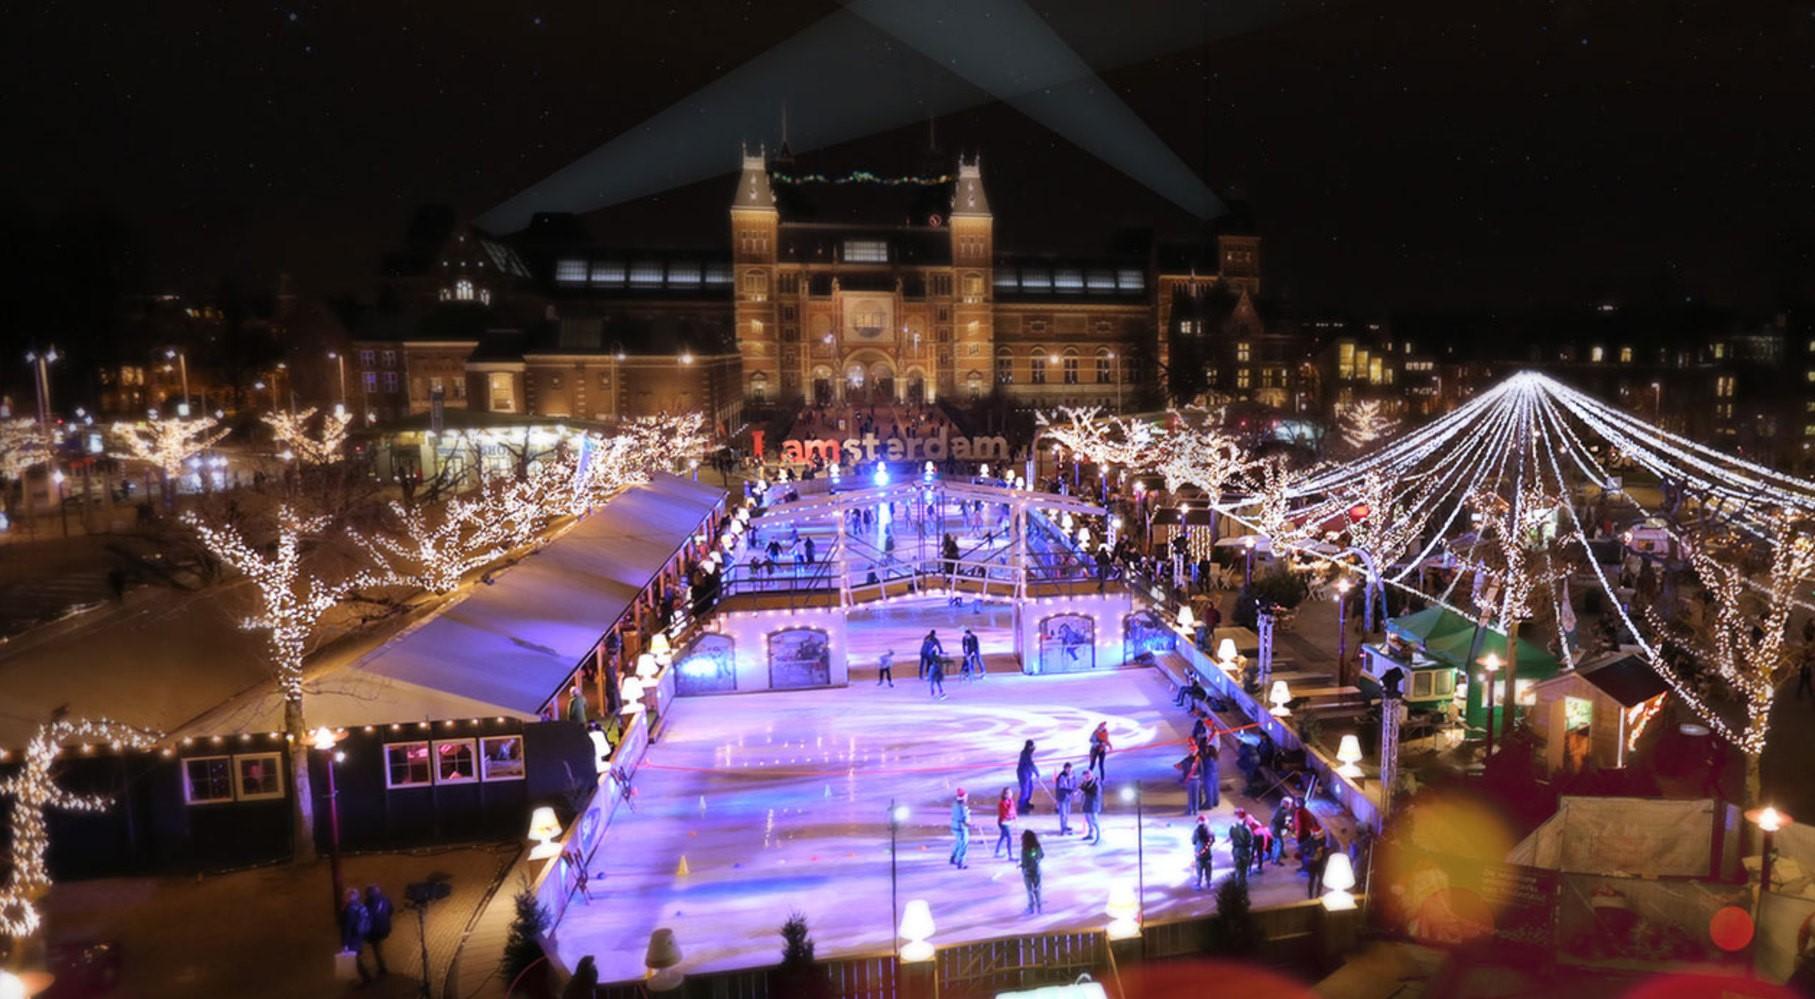 Source: Ice Amsterdam